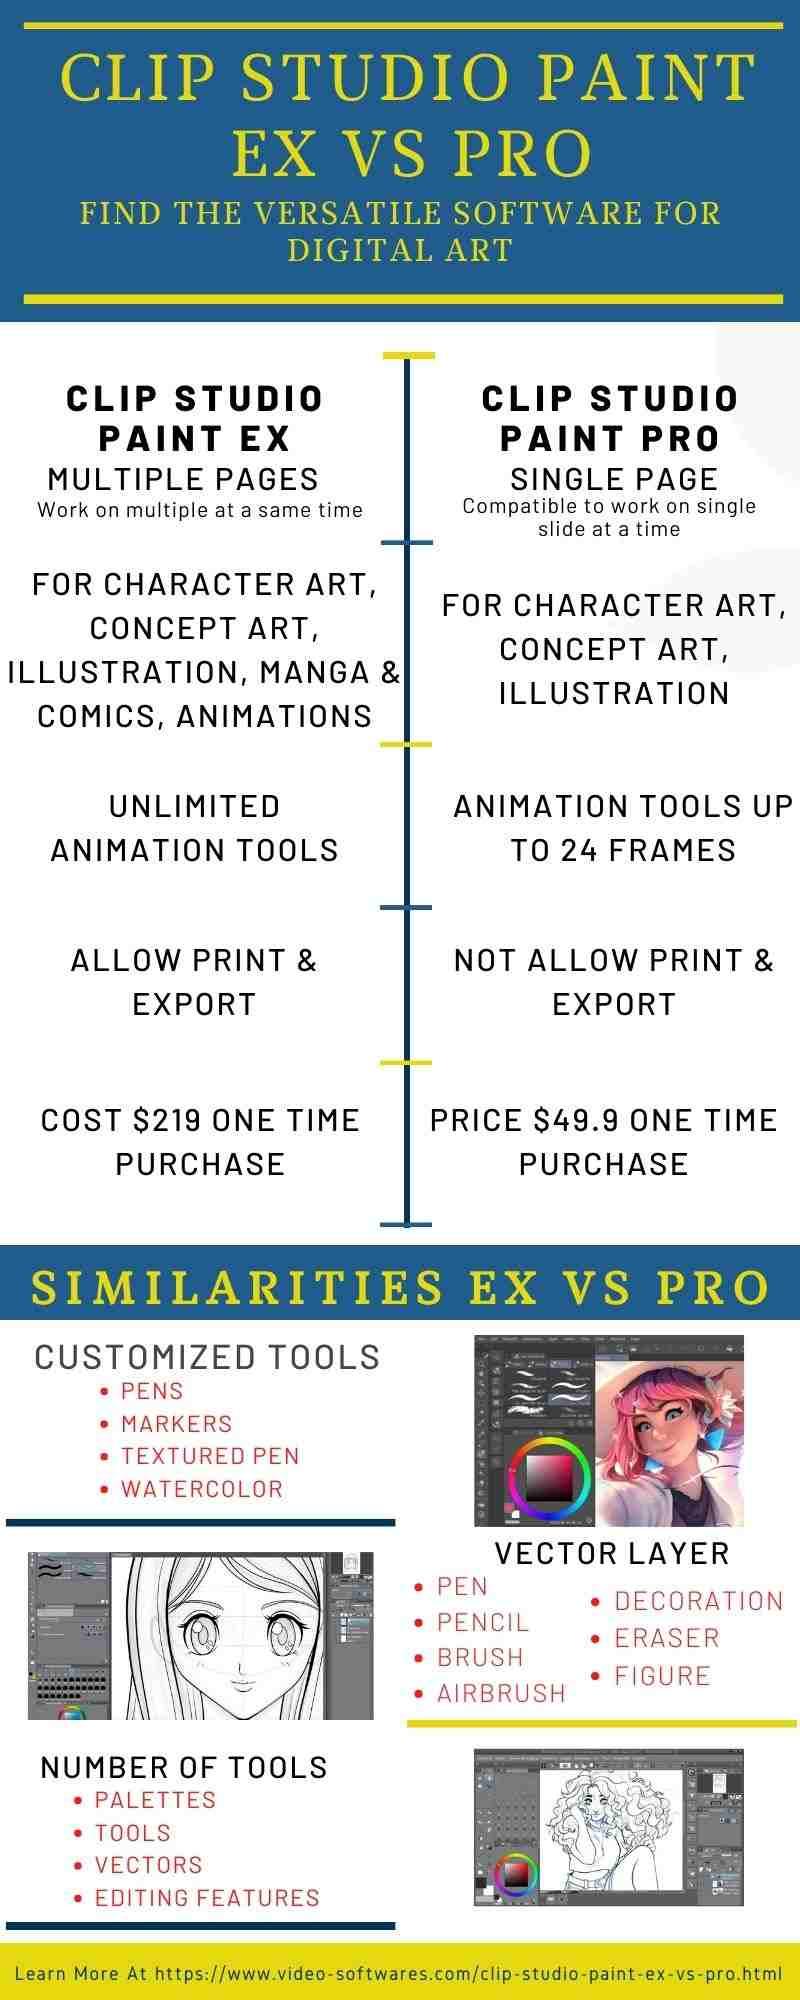 Clip Studio Paint Ex Vs Pro